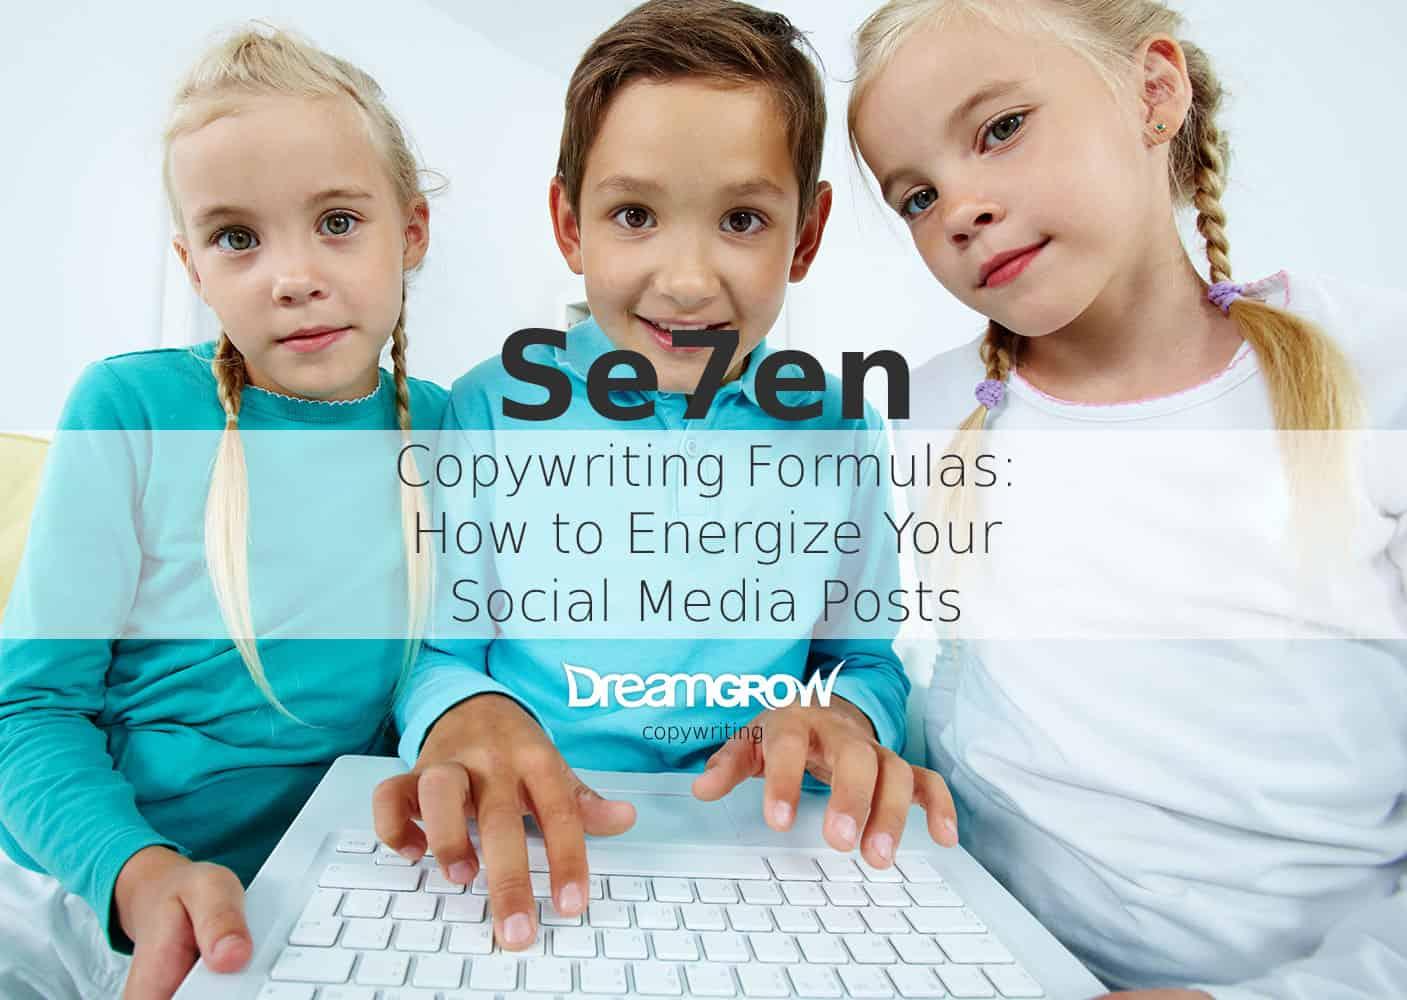 copywriting formulas social media